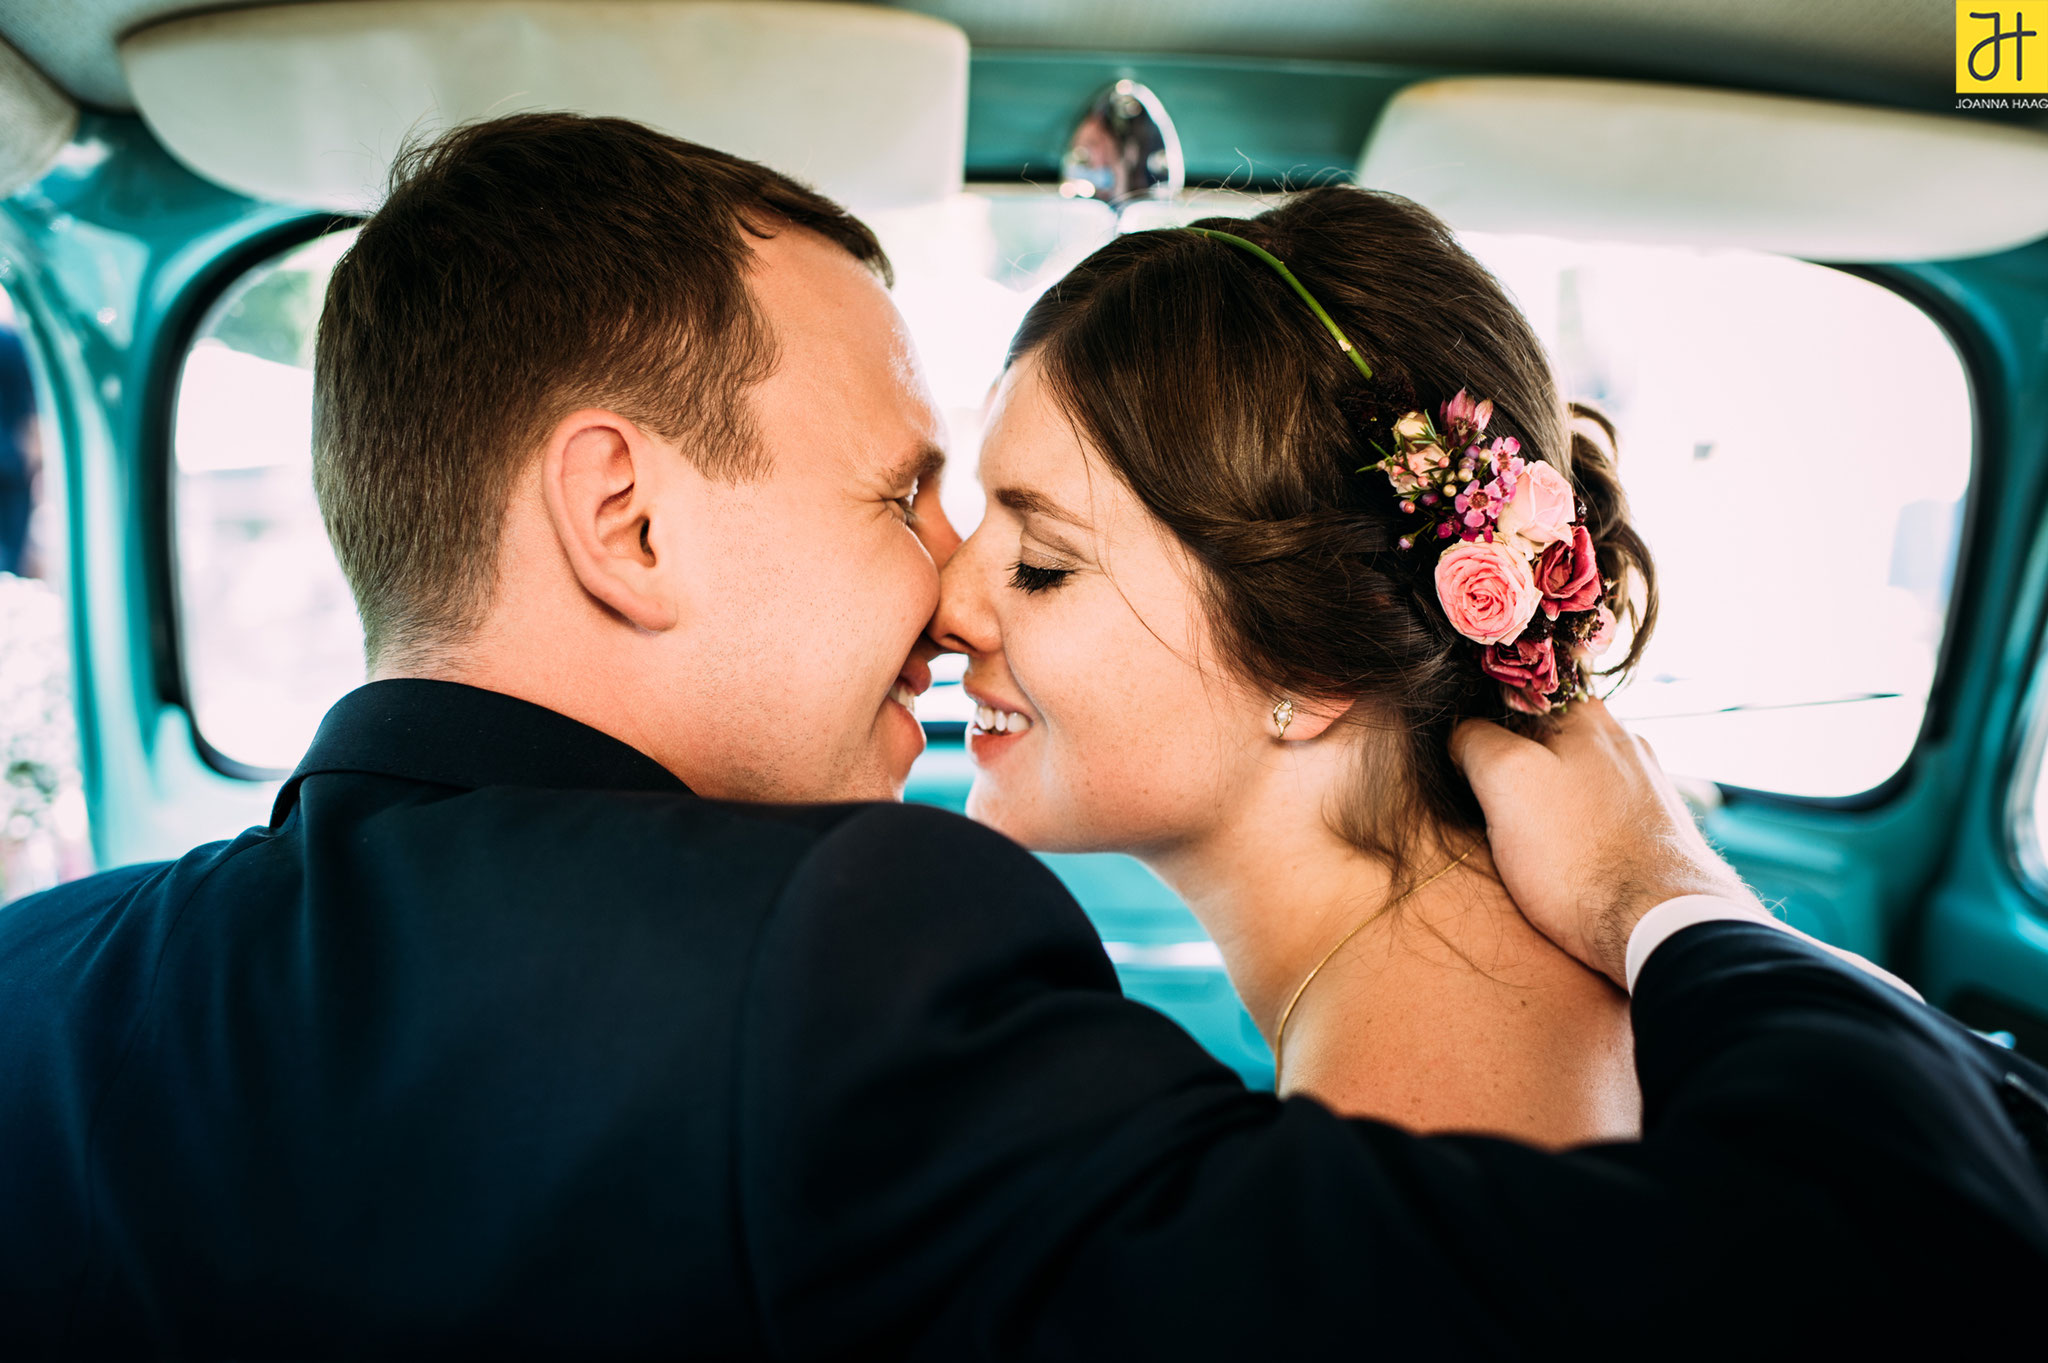 © JOANNA HAAG / #Hochzeit #Brautpaarshooting #Brautpaar #Villingen